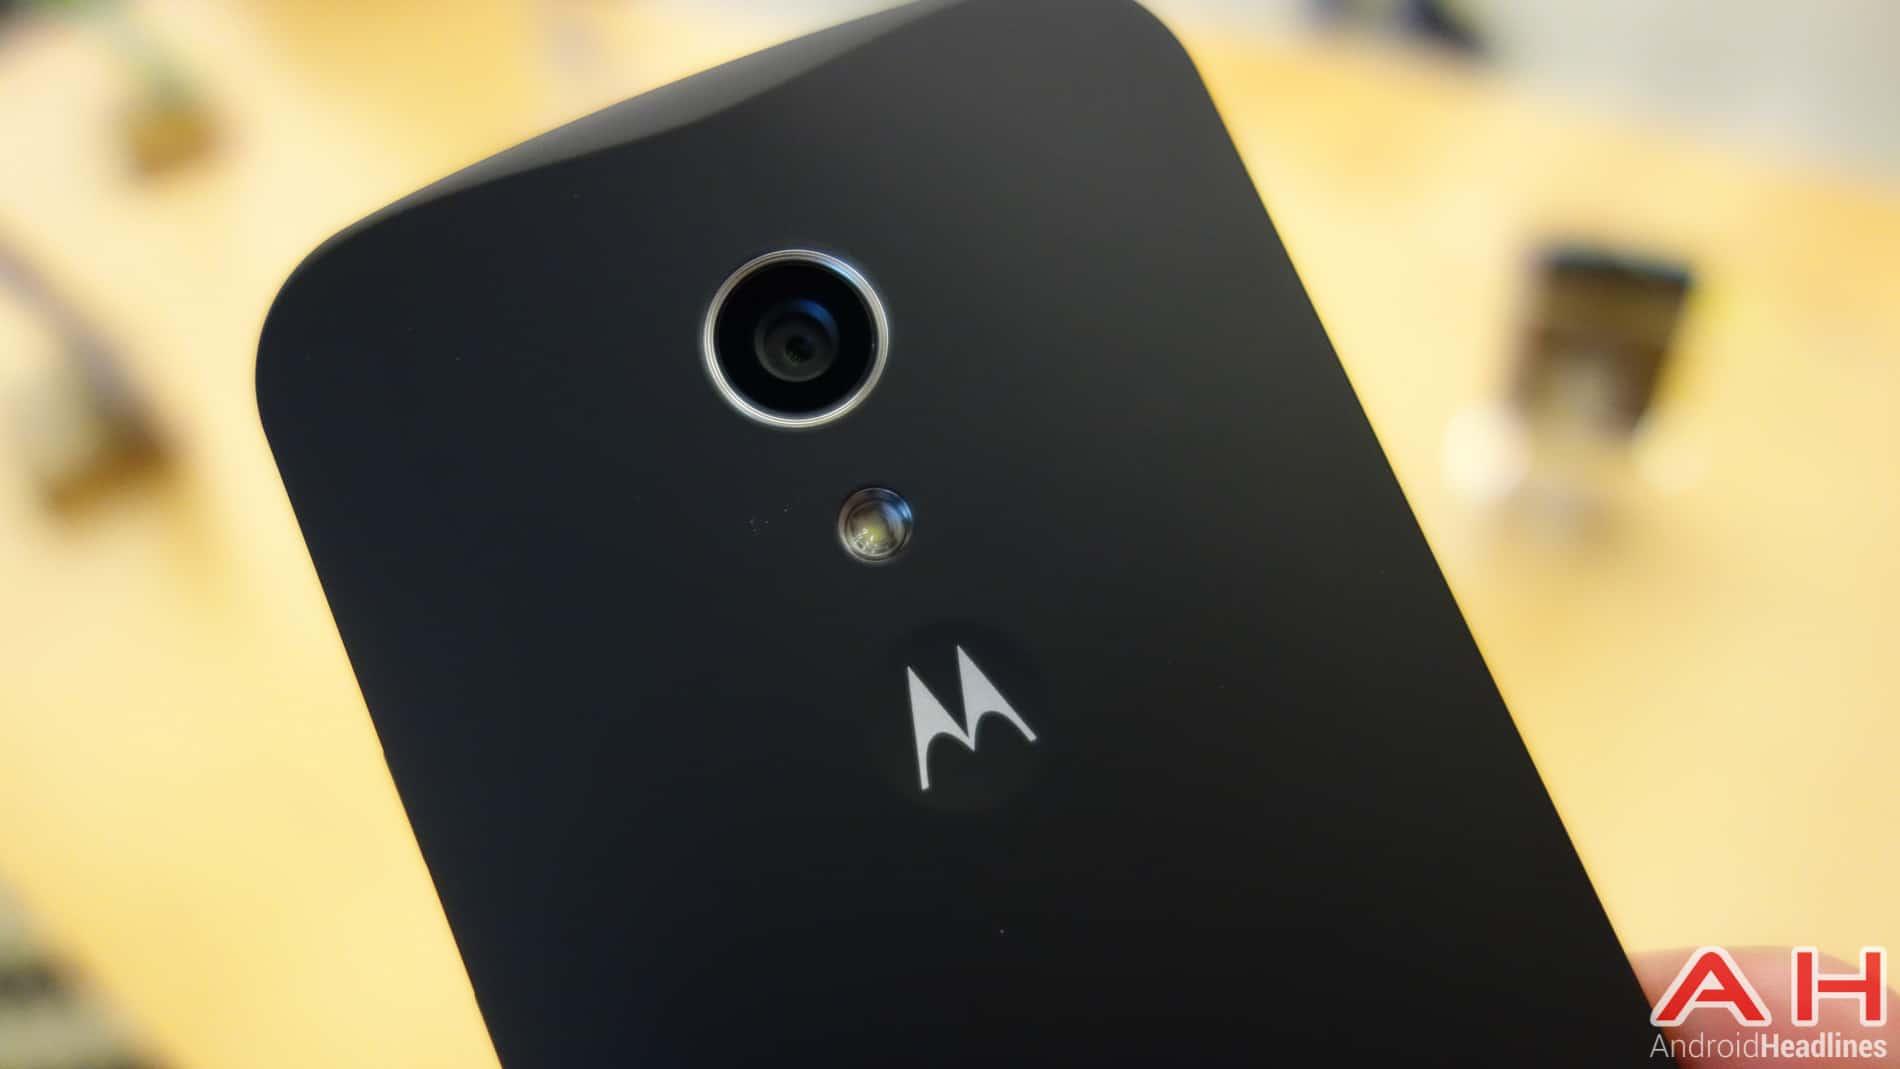 Motorola AH 190